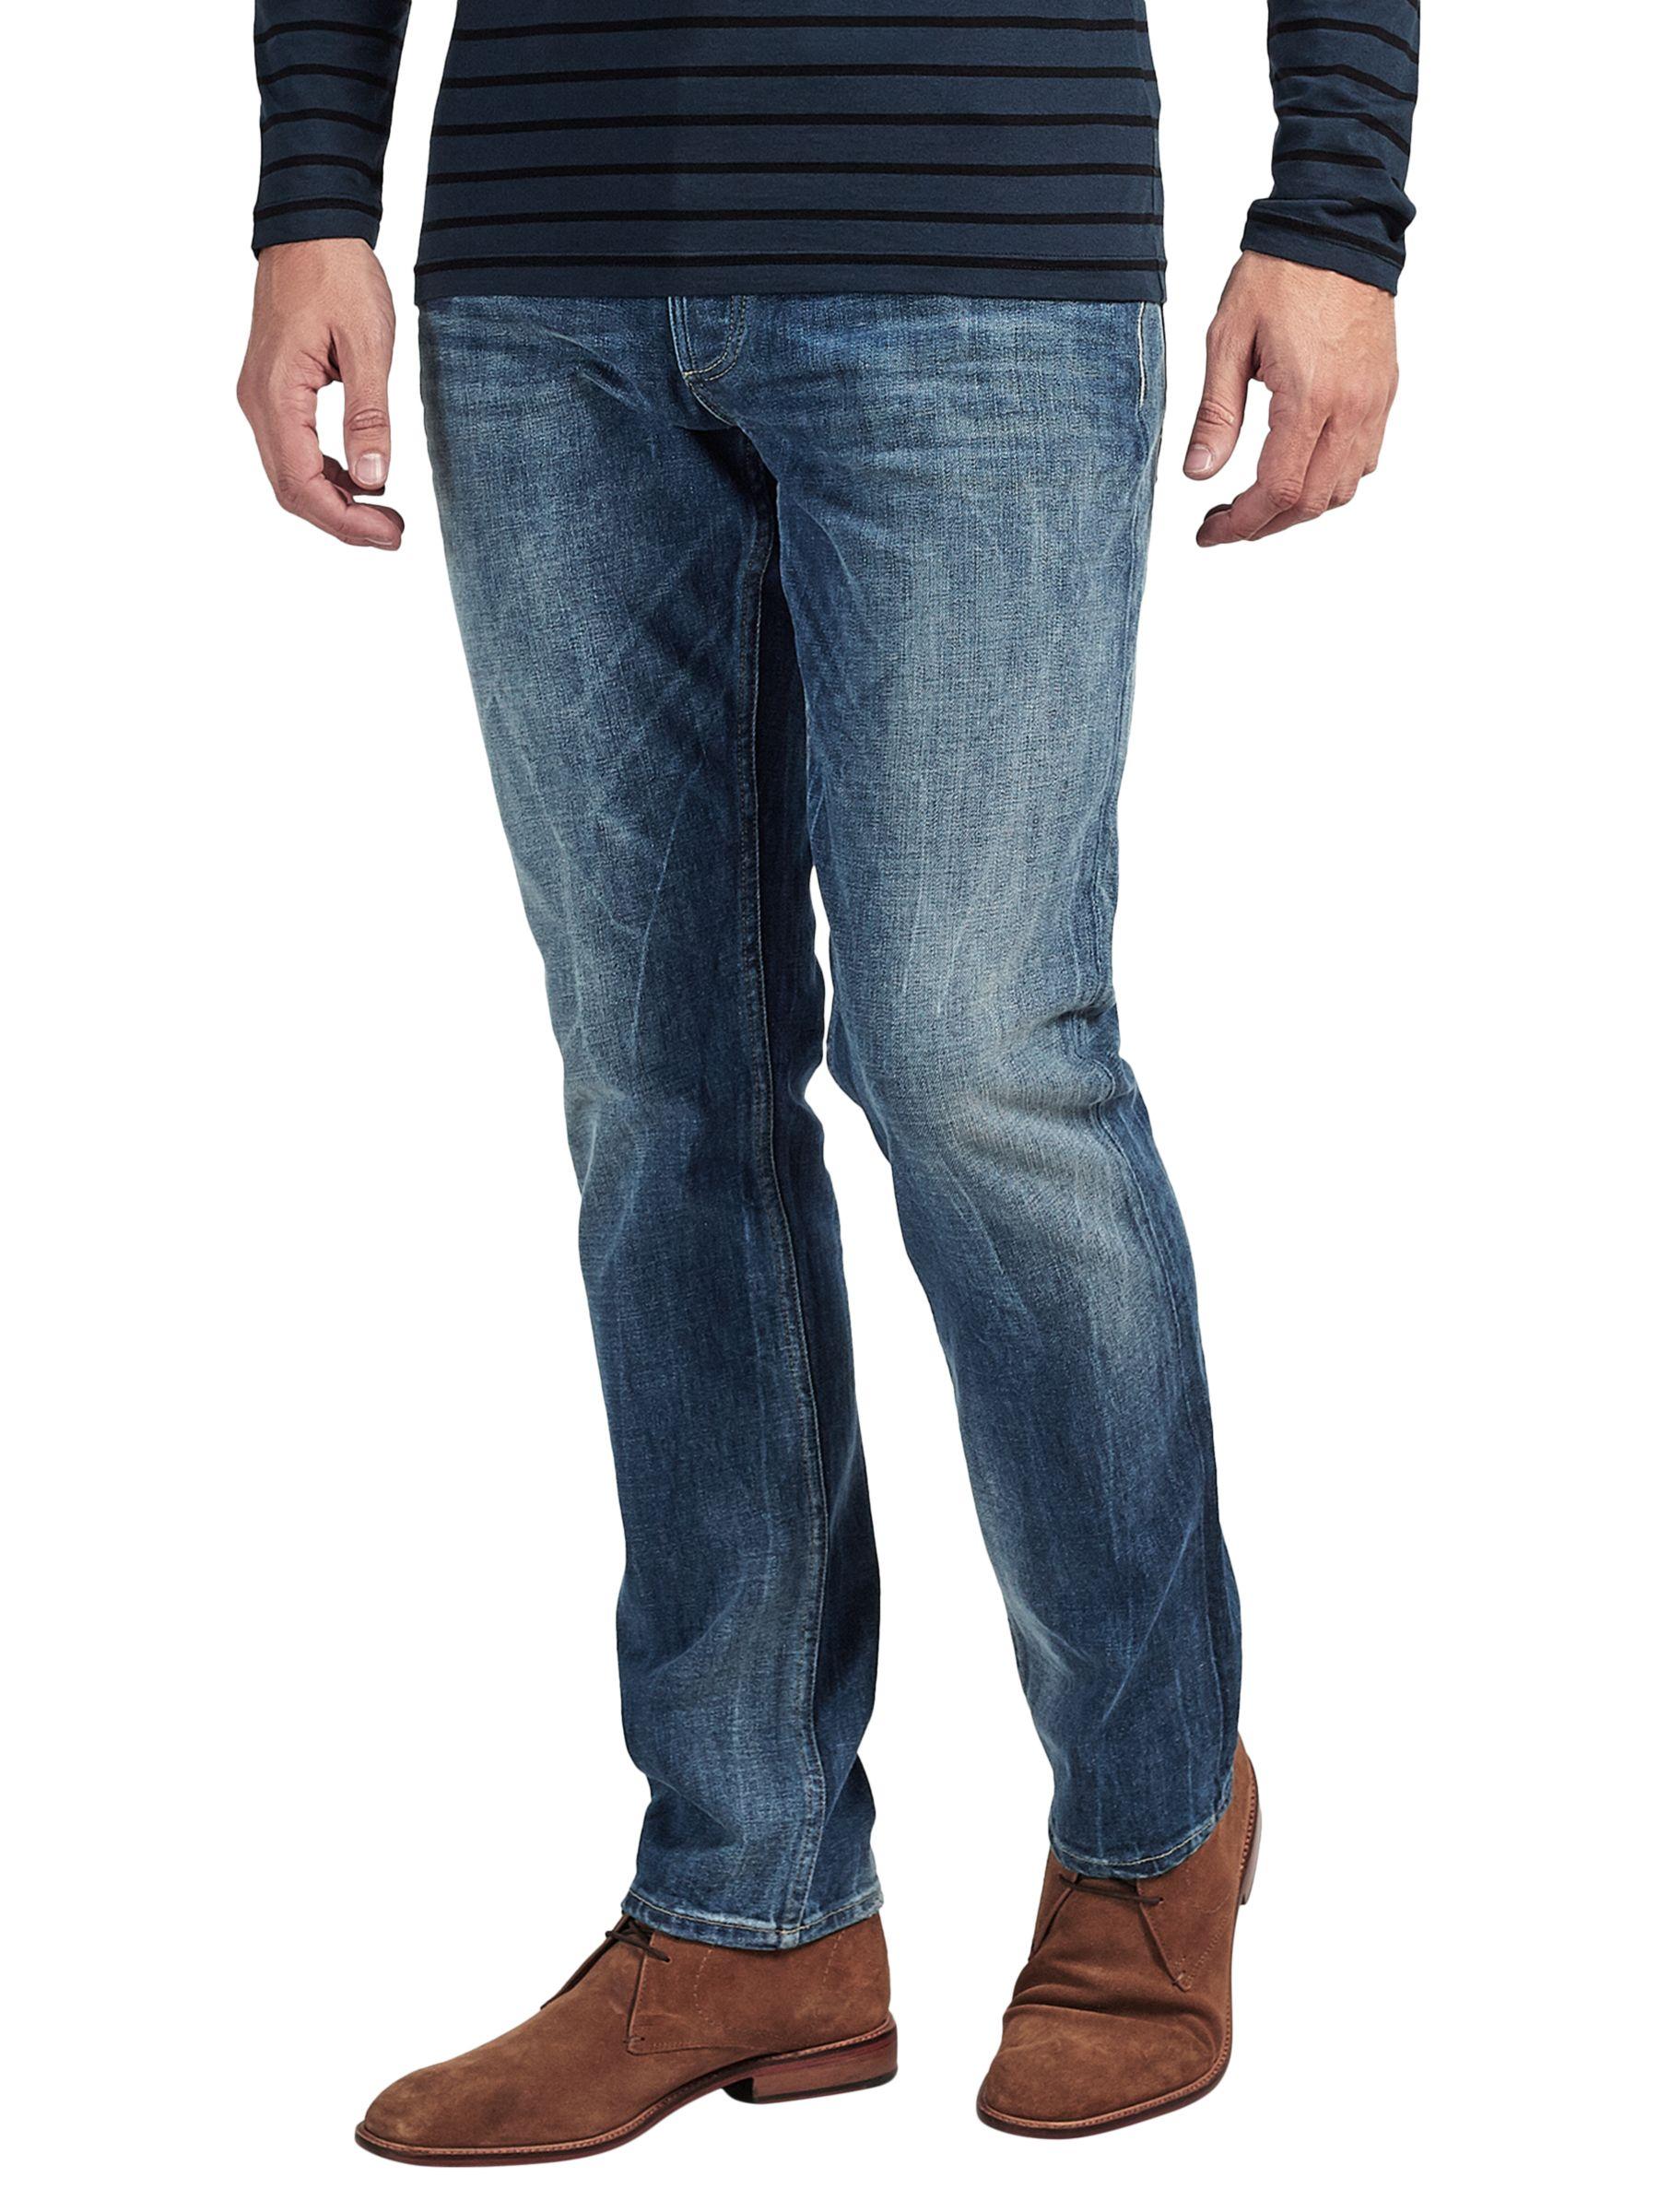 Denham Denham Drill Regular Fit Stretch Jeans, Washed Blue